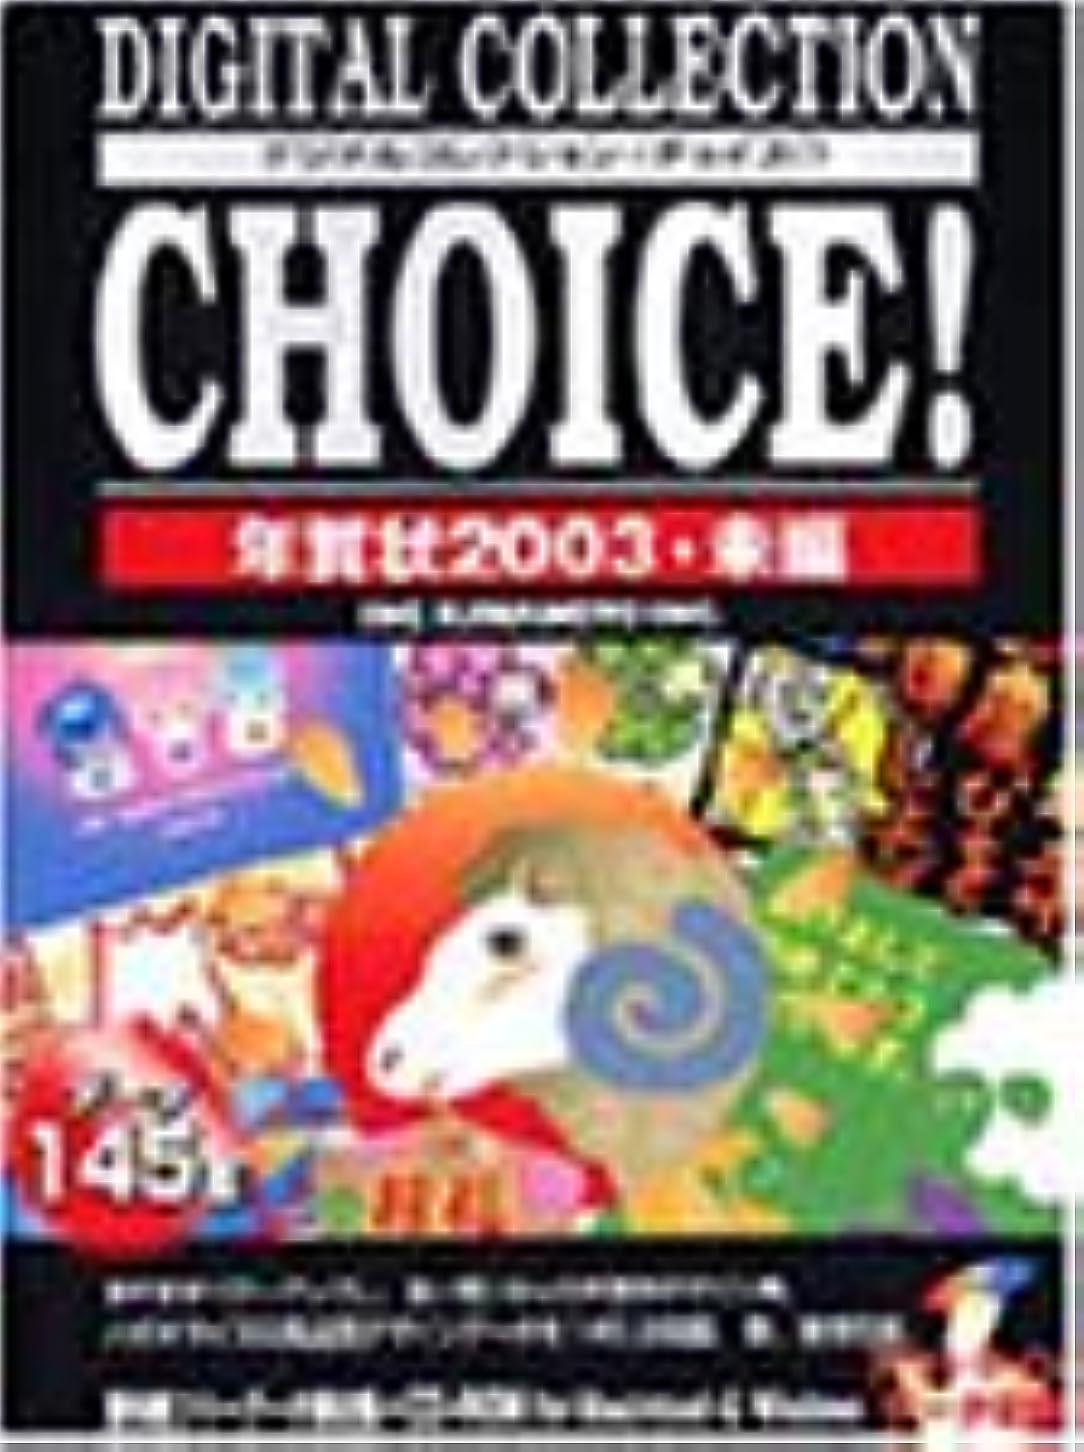 Digital Collection Choice! 年賀状 2003?未編